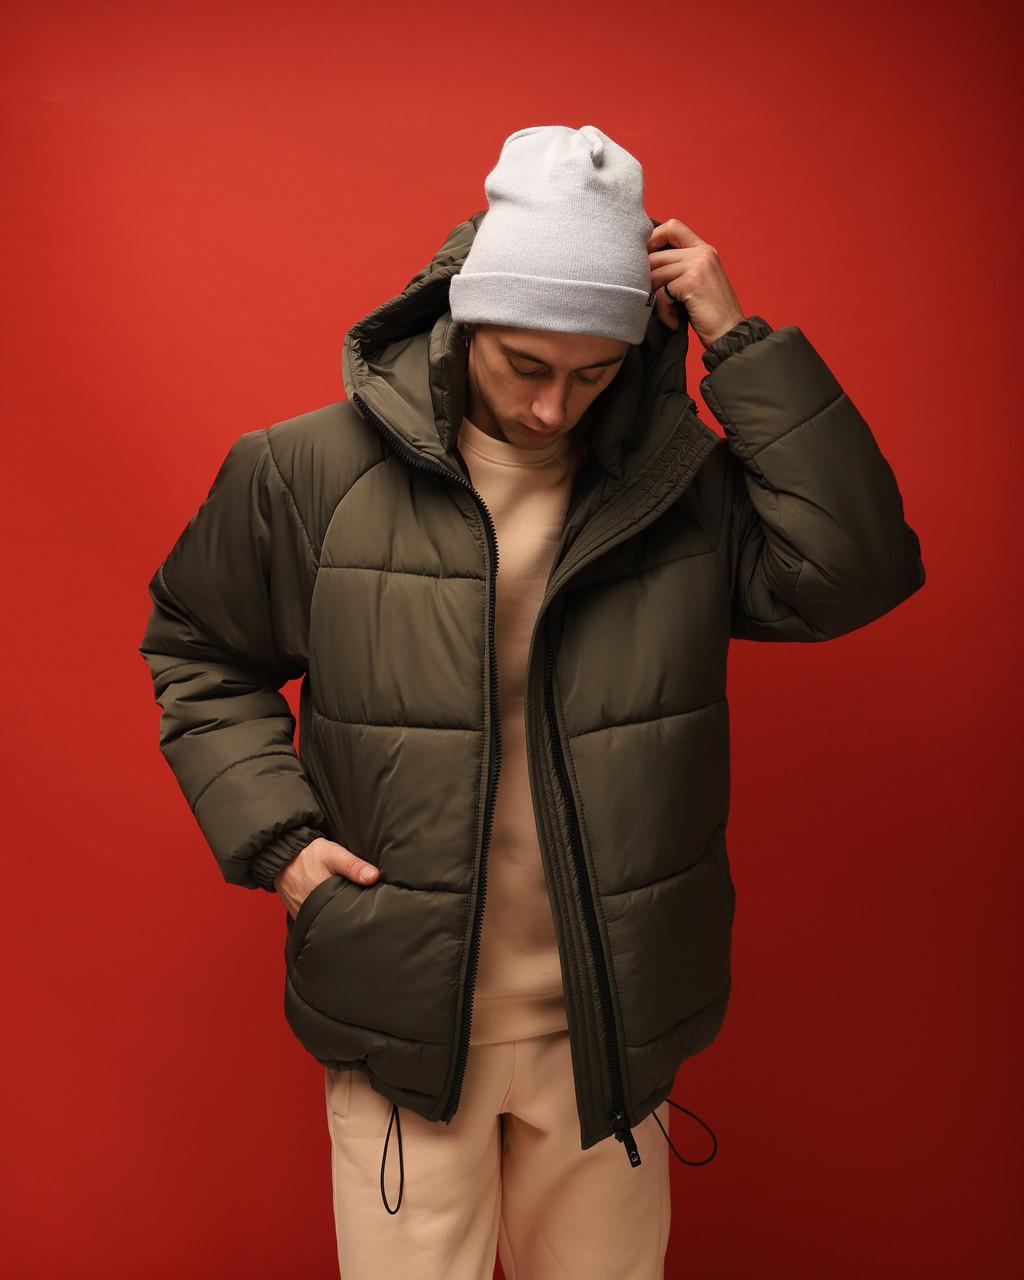 Зимняя куртка мужская хаки бренд ТУР модель Брэт